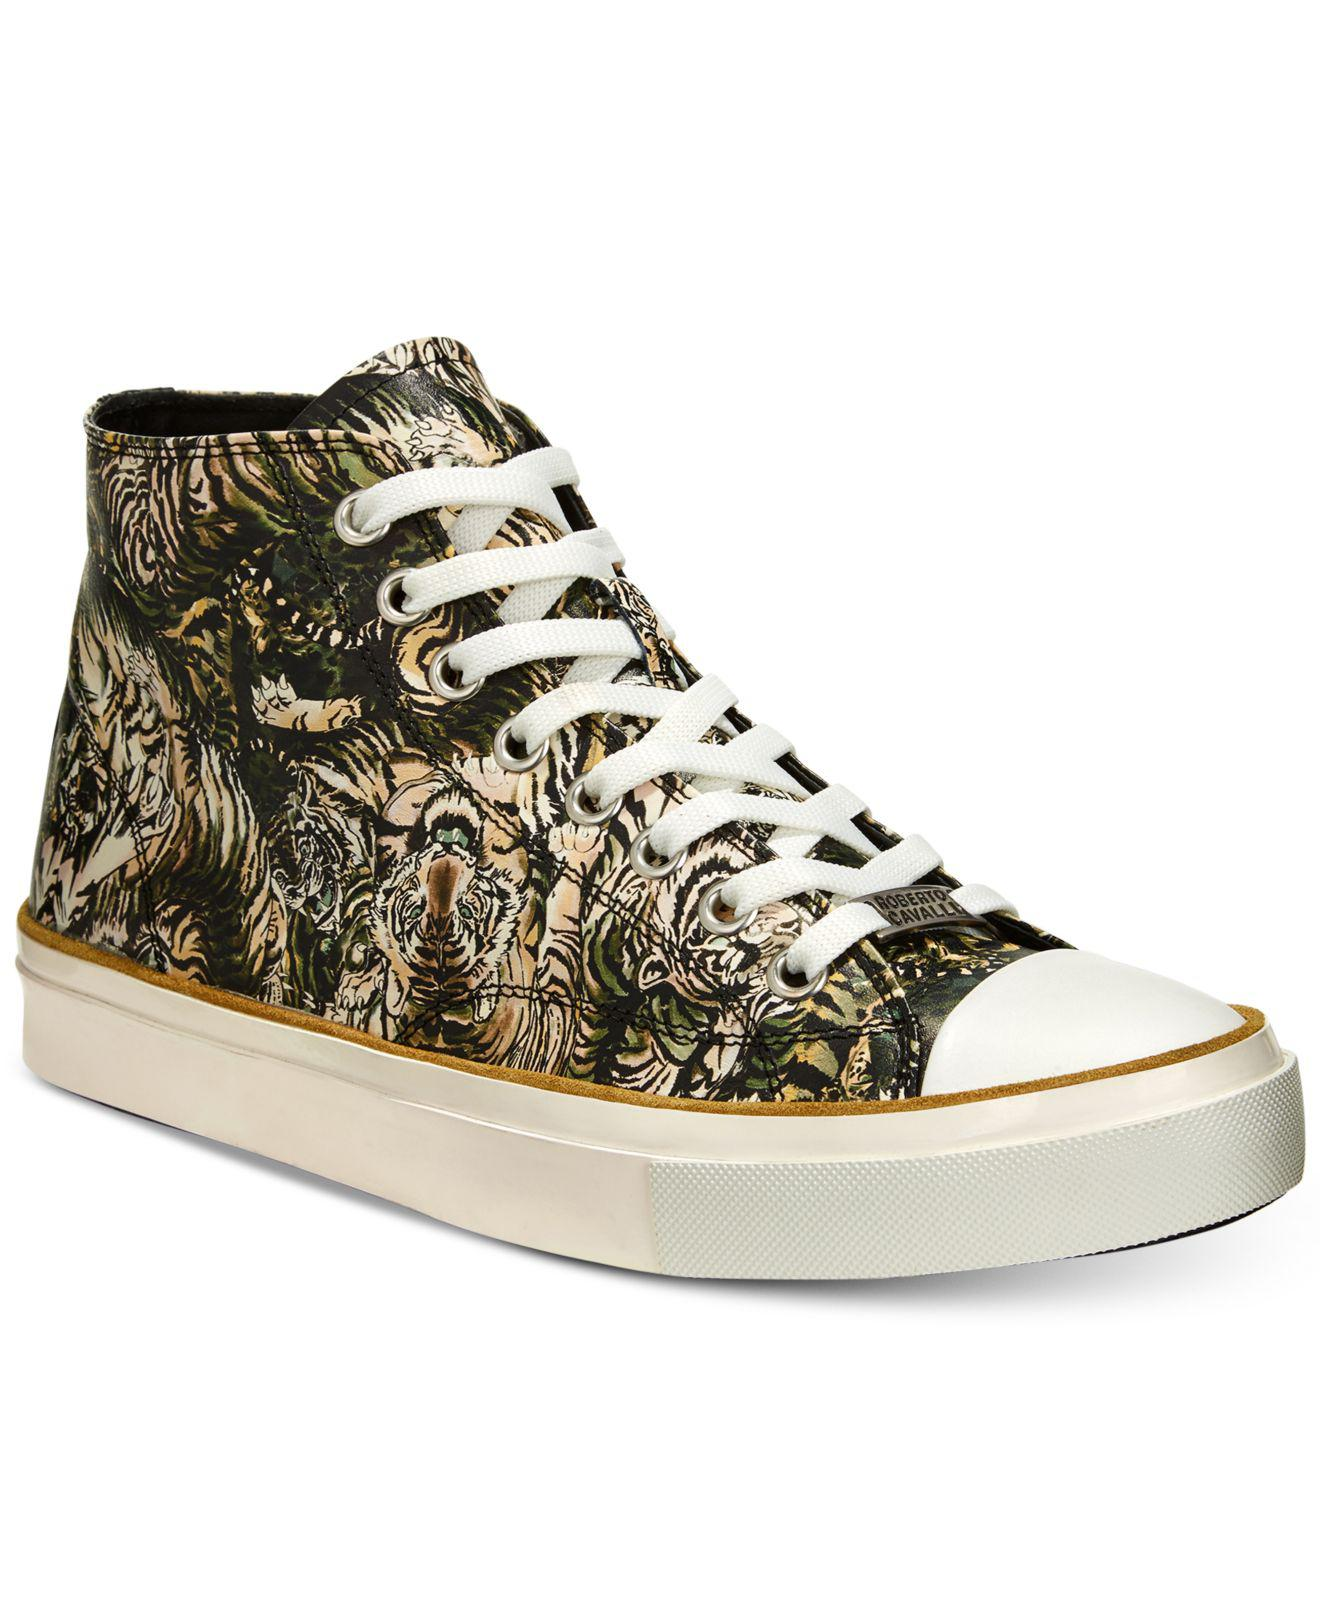 6a19dc4faca Roberto Cavalli Multicolor Mike Tiger-print High-top Sneakers for men